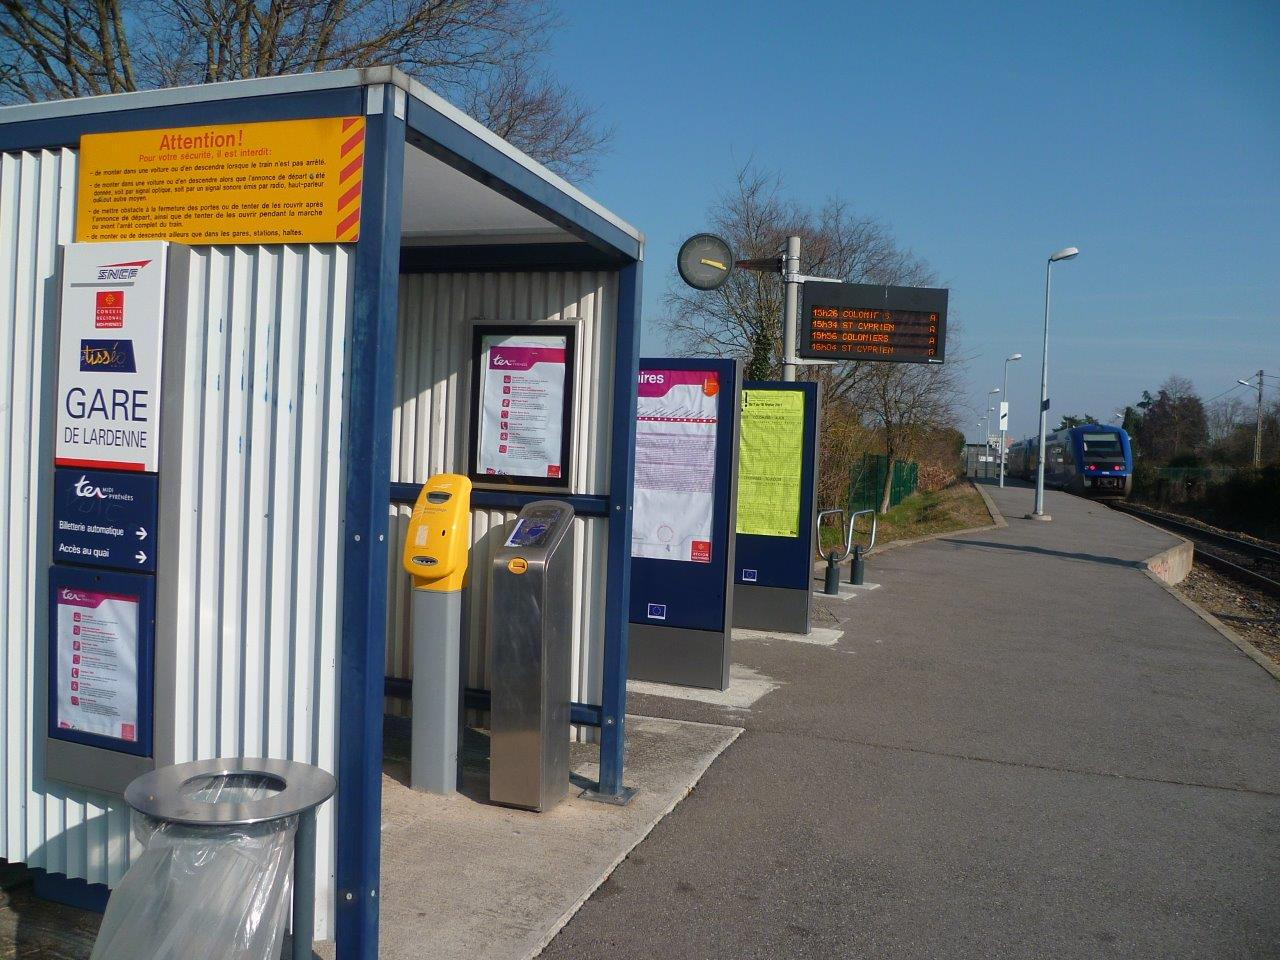 gare-de-lardenne-train-station